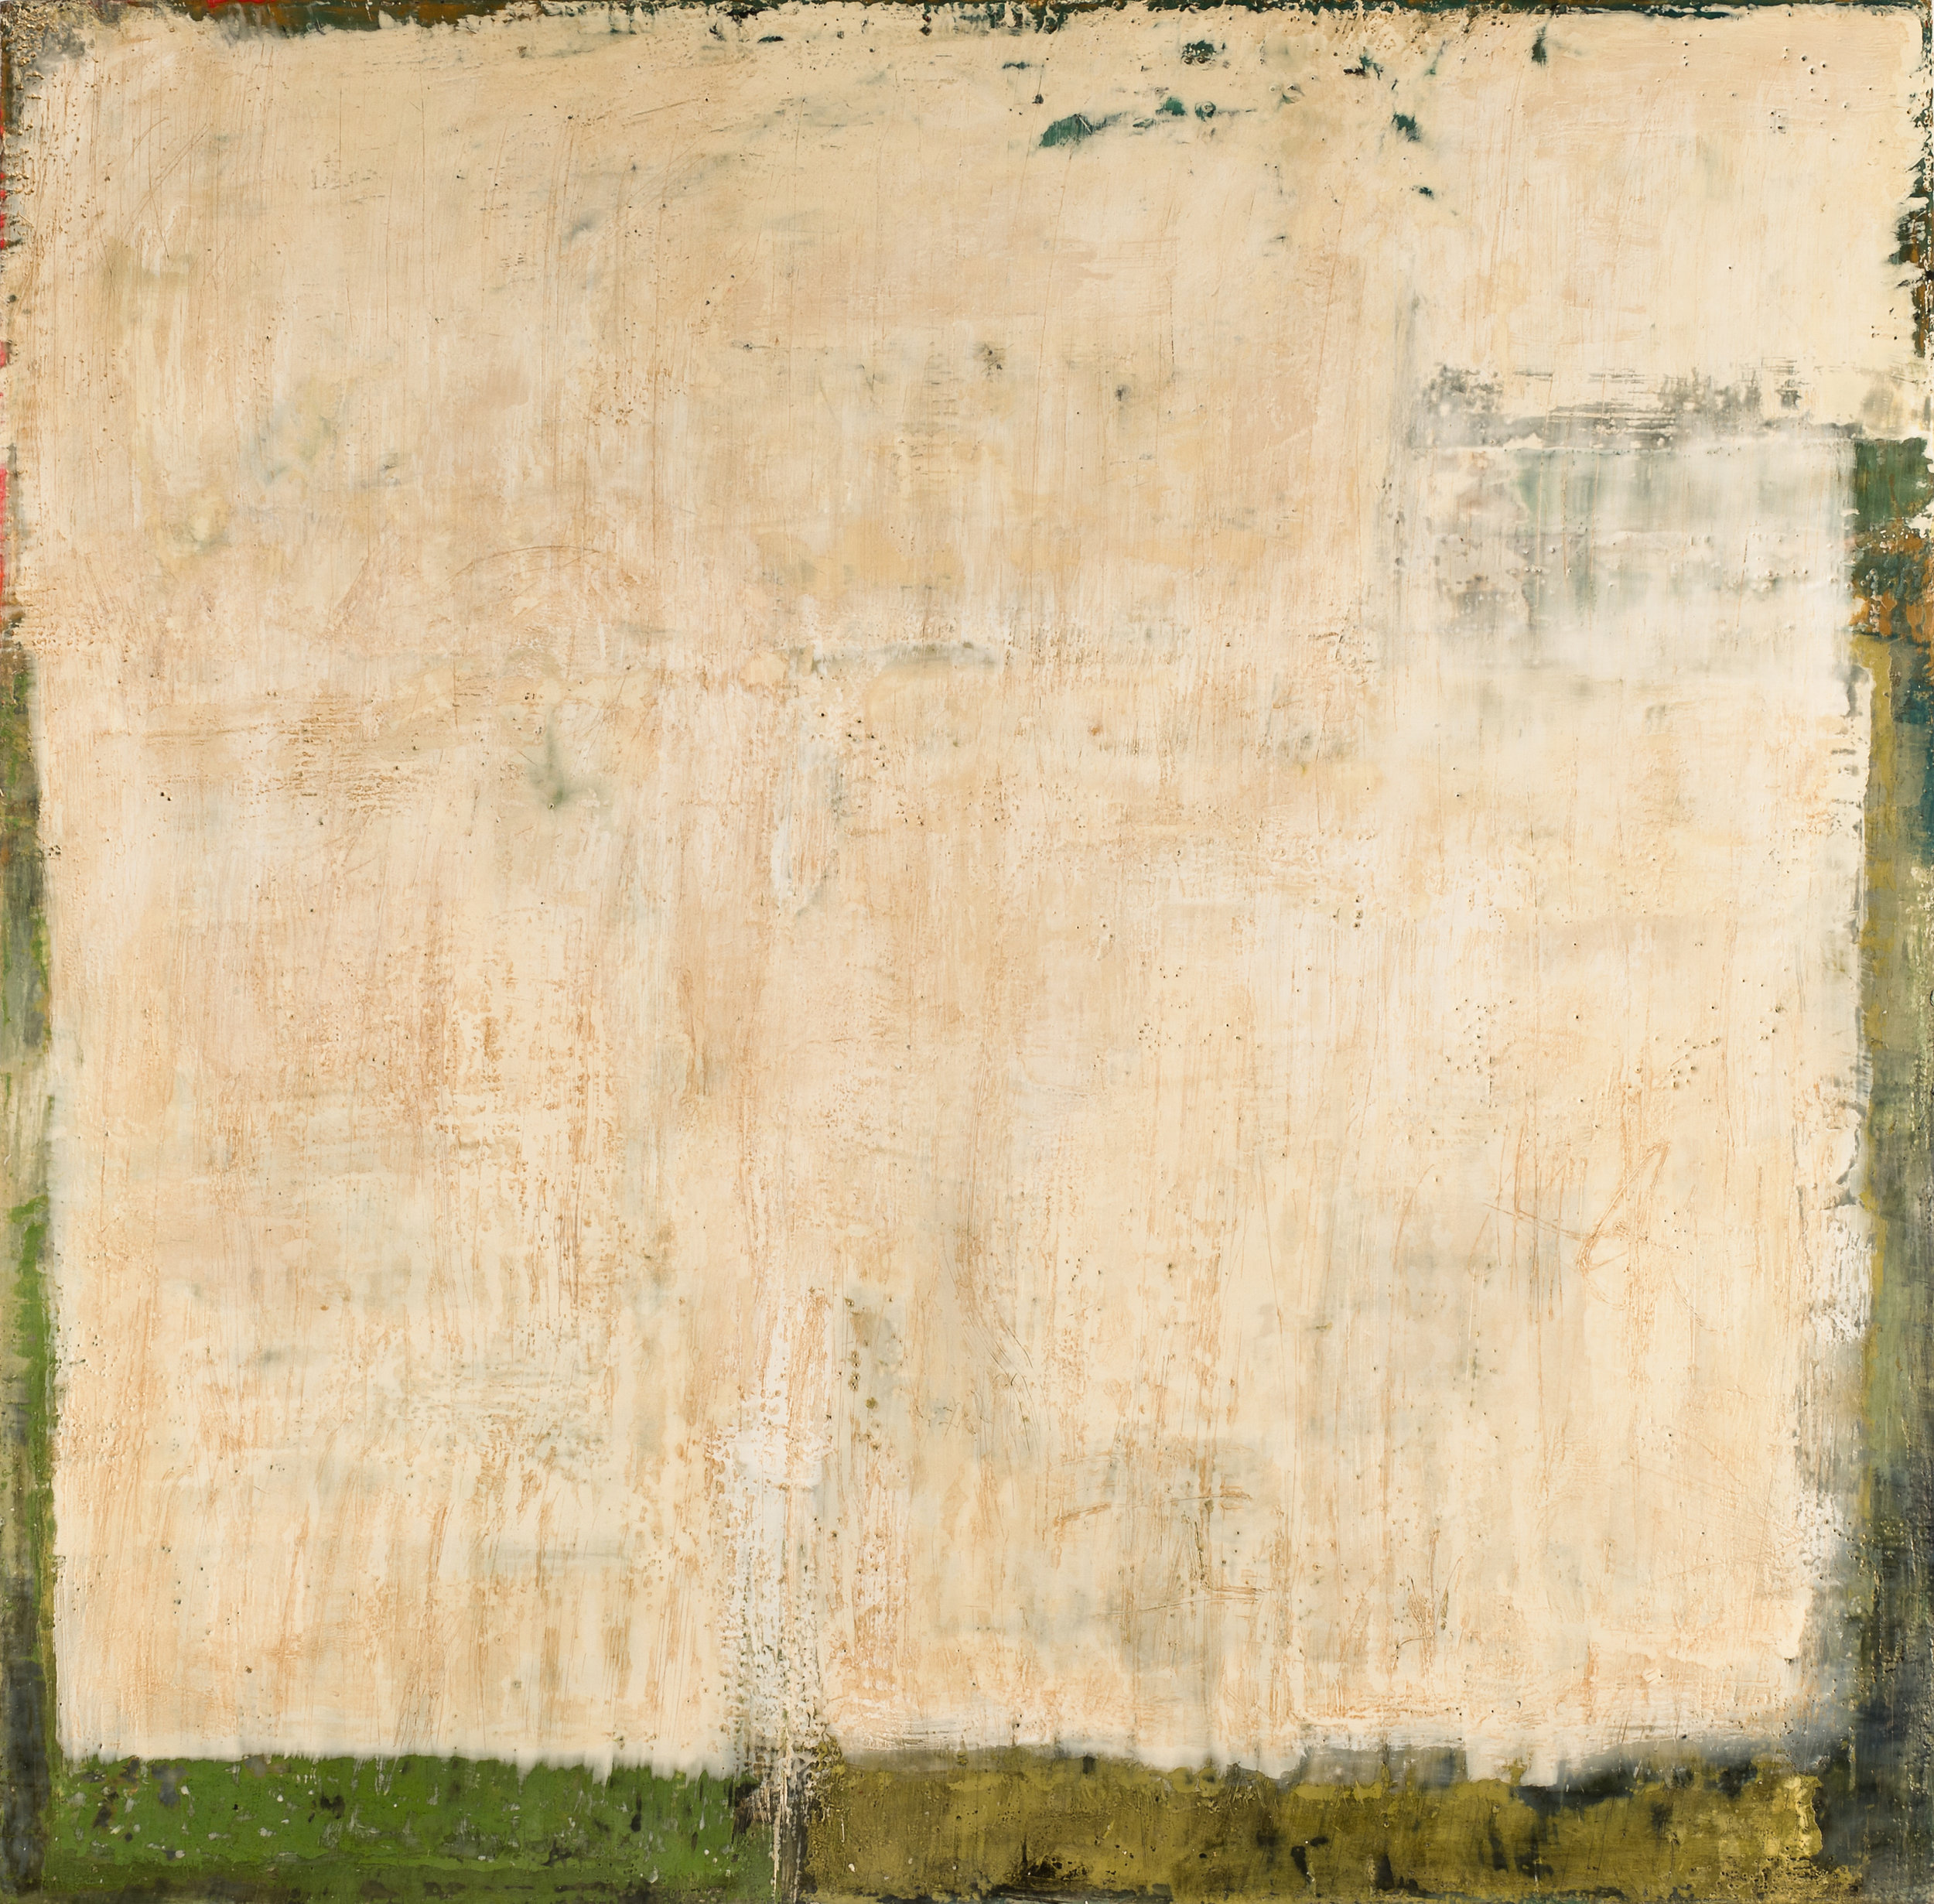 Sue Gordon, Returning Soon, Encaustic on Birch Panel, 40x40, 2016